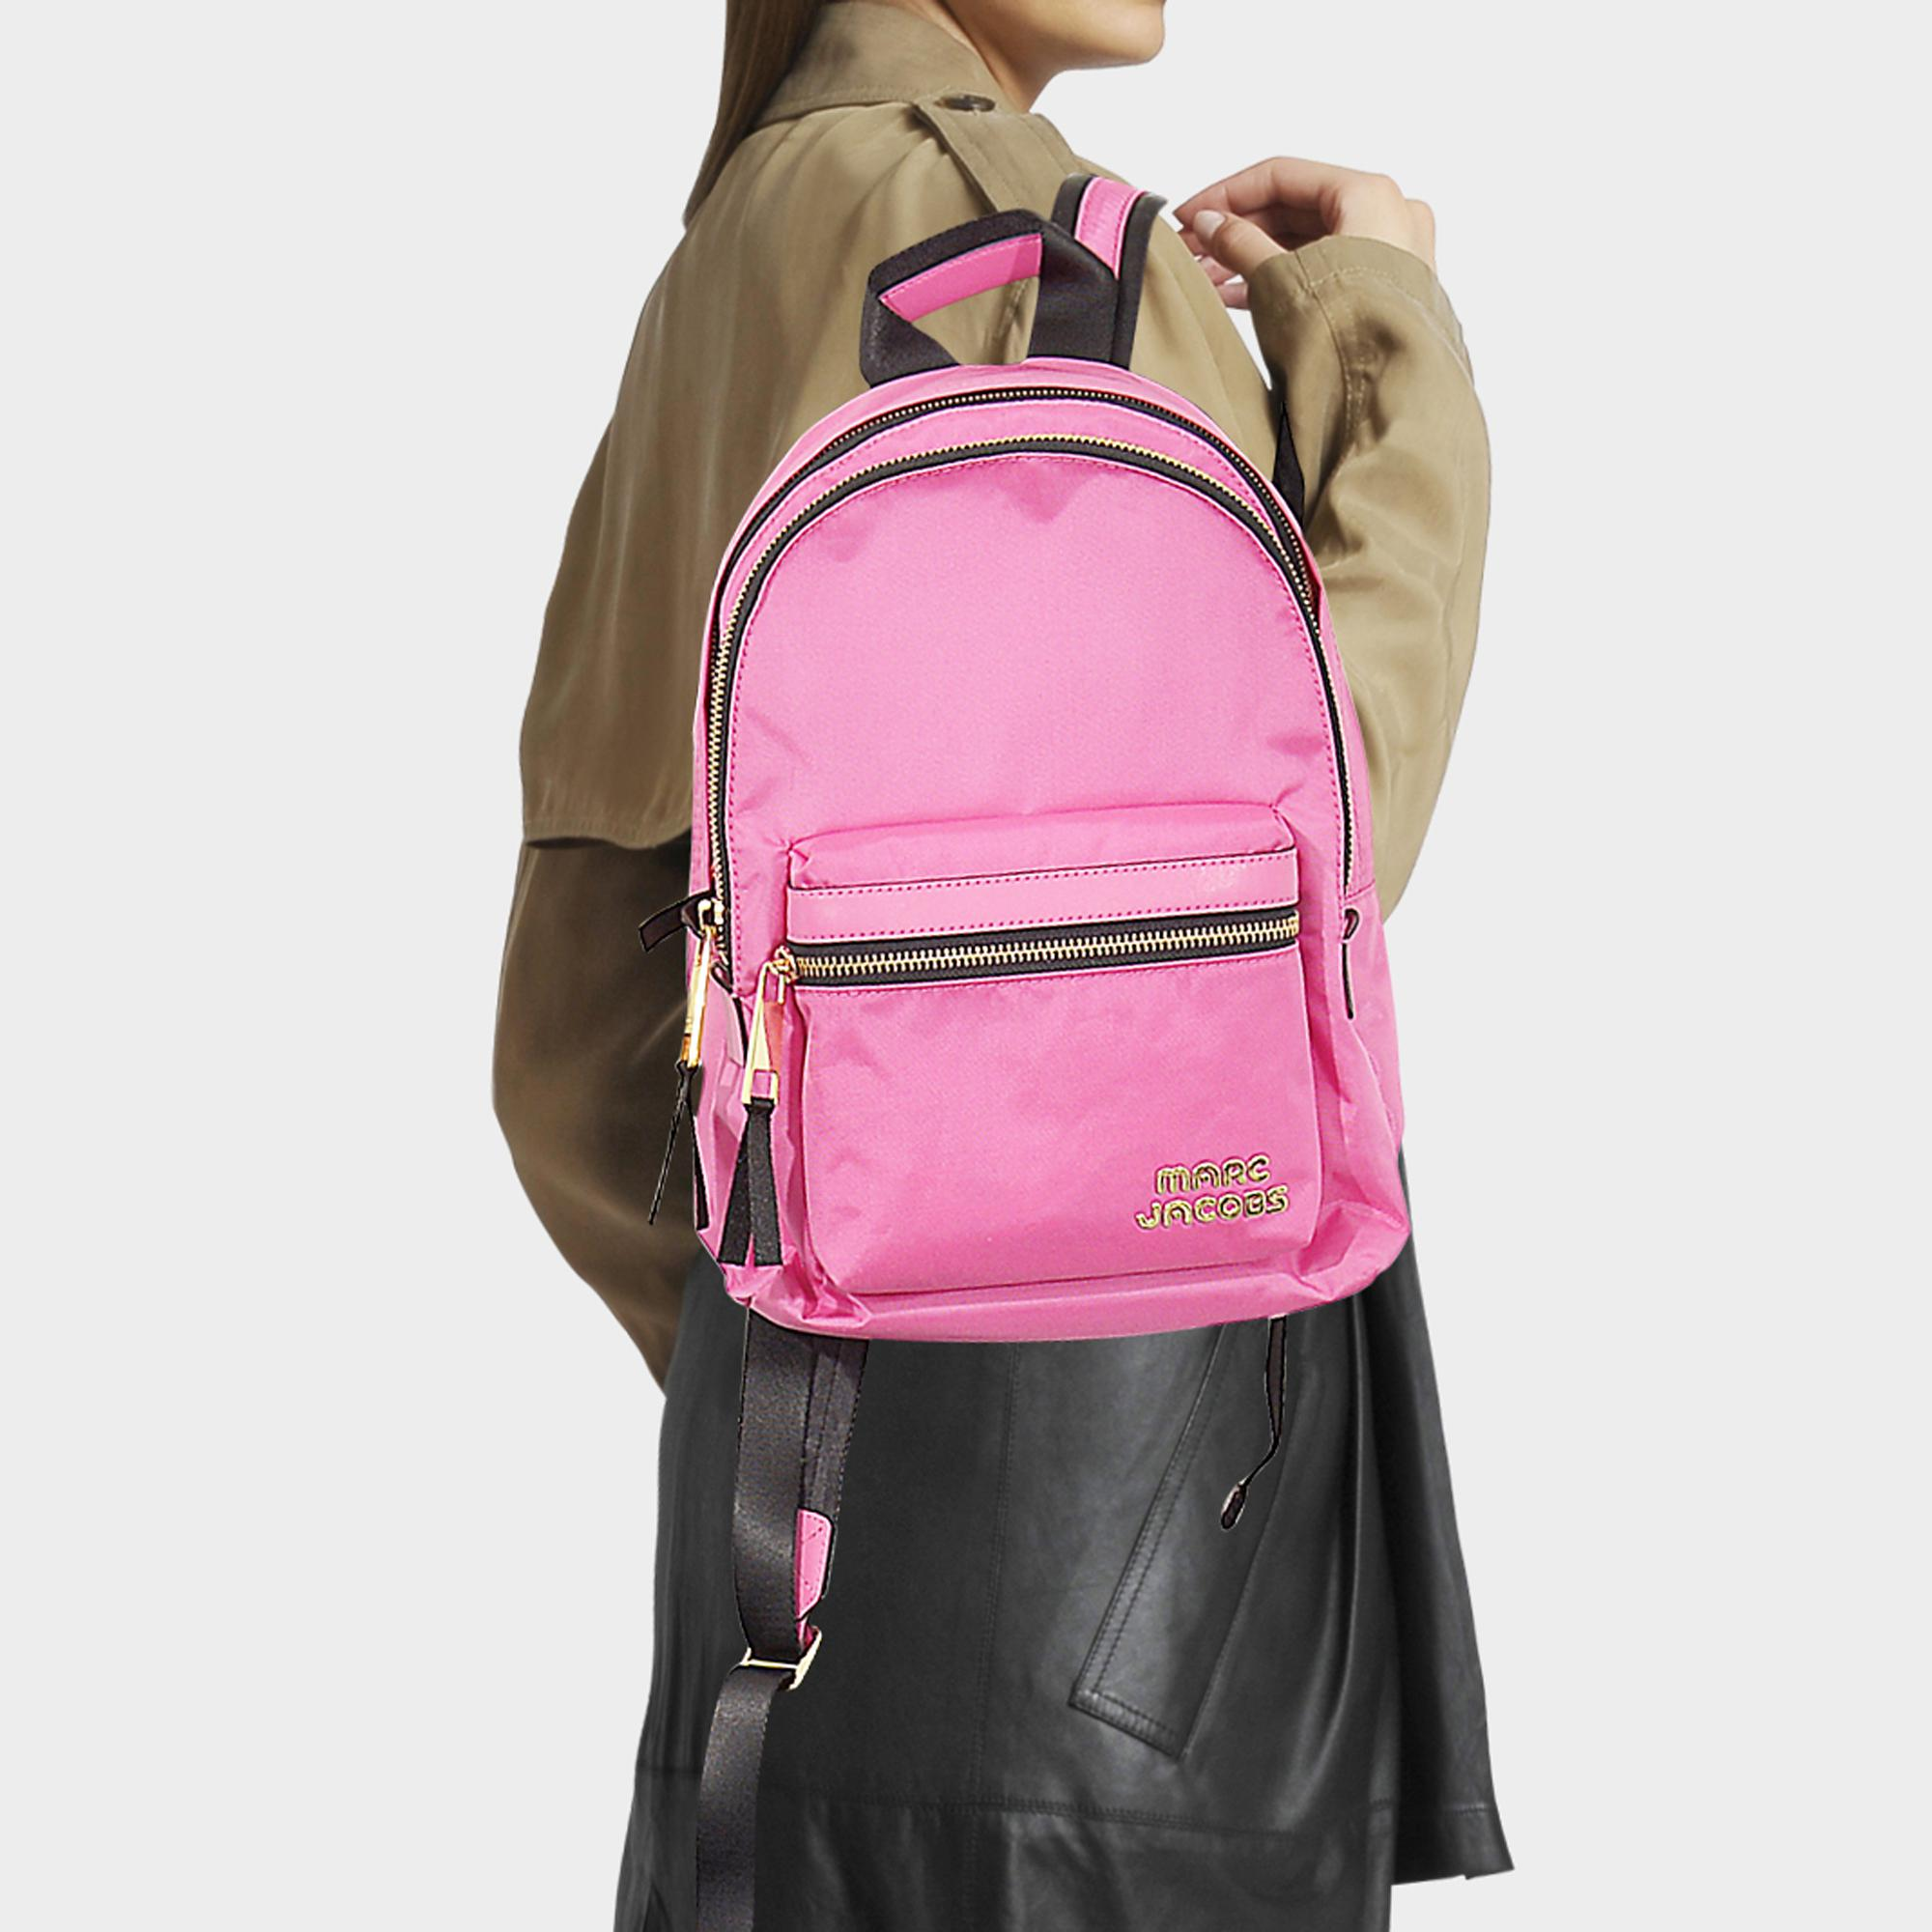 Marc Jacobs Trek Pack Medium Backpack in Pink - Lyst afc756db46e9d